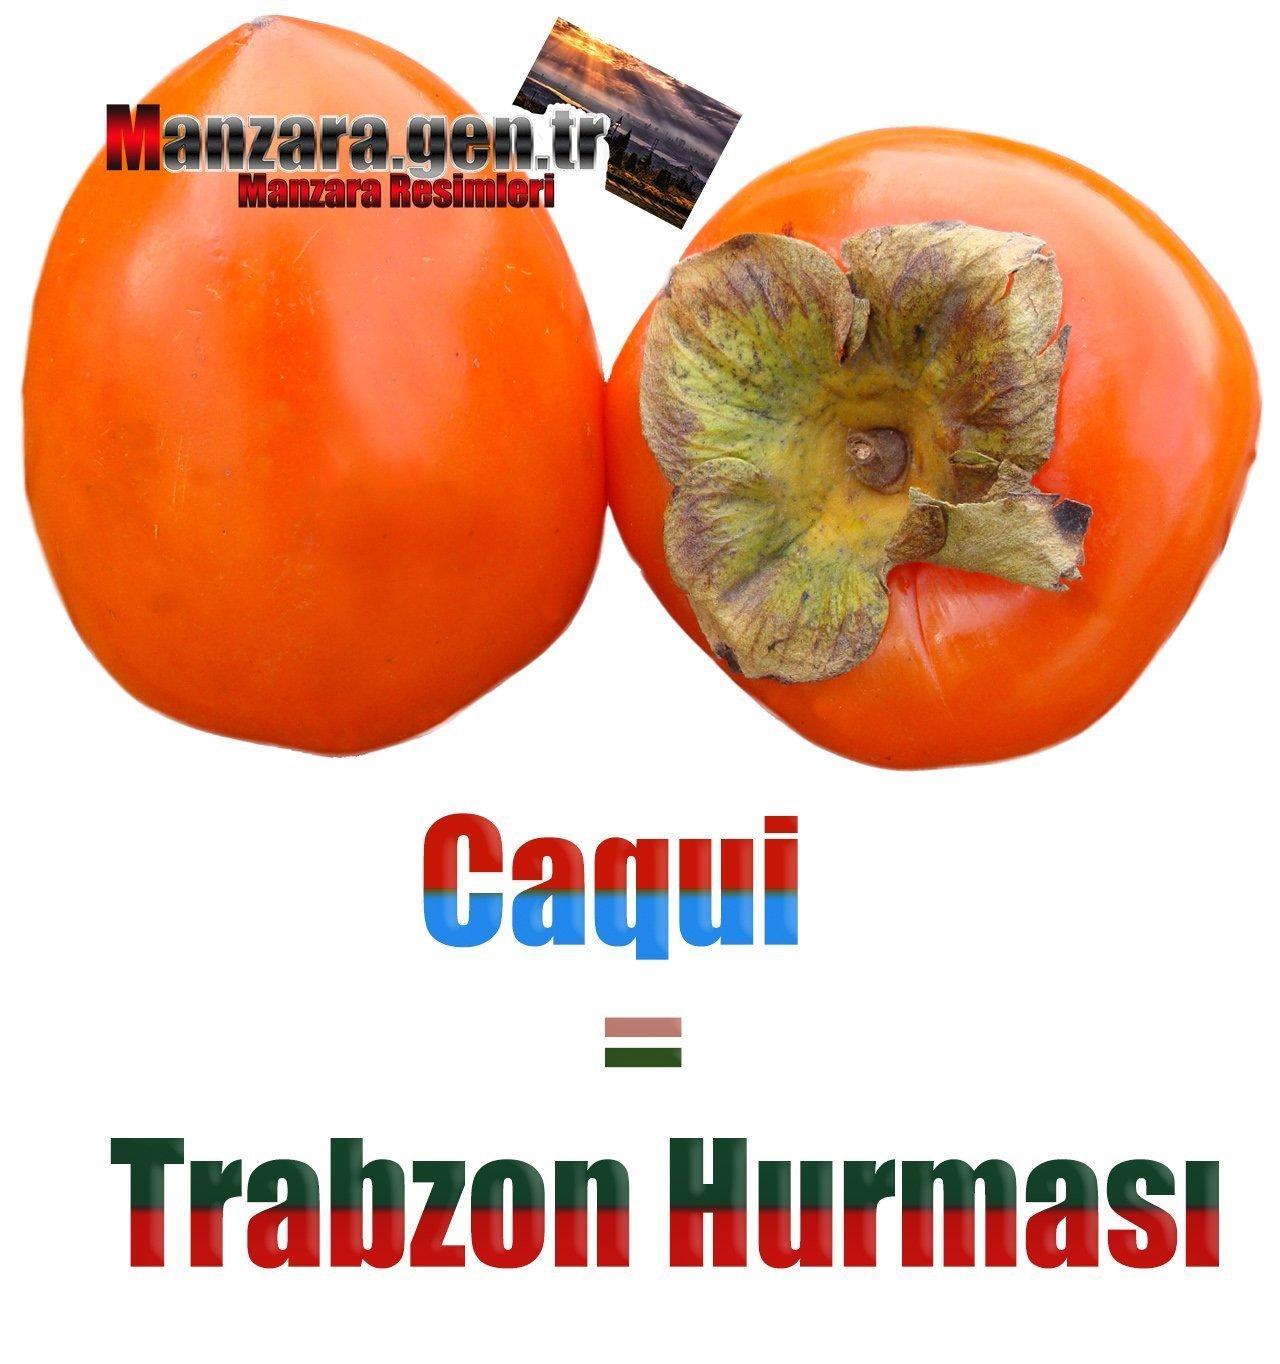 İspanyolca Meyve İsimleri - Trabzon Hurması İspanyolcası (Caqui)